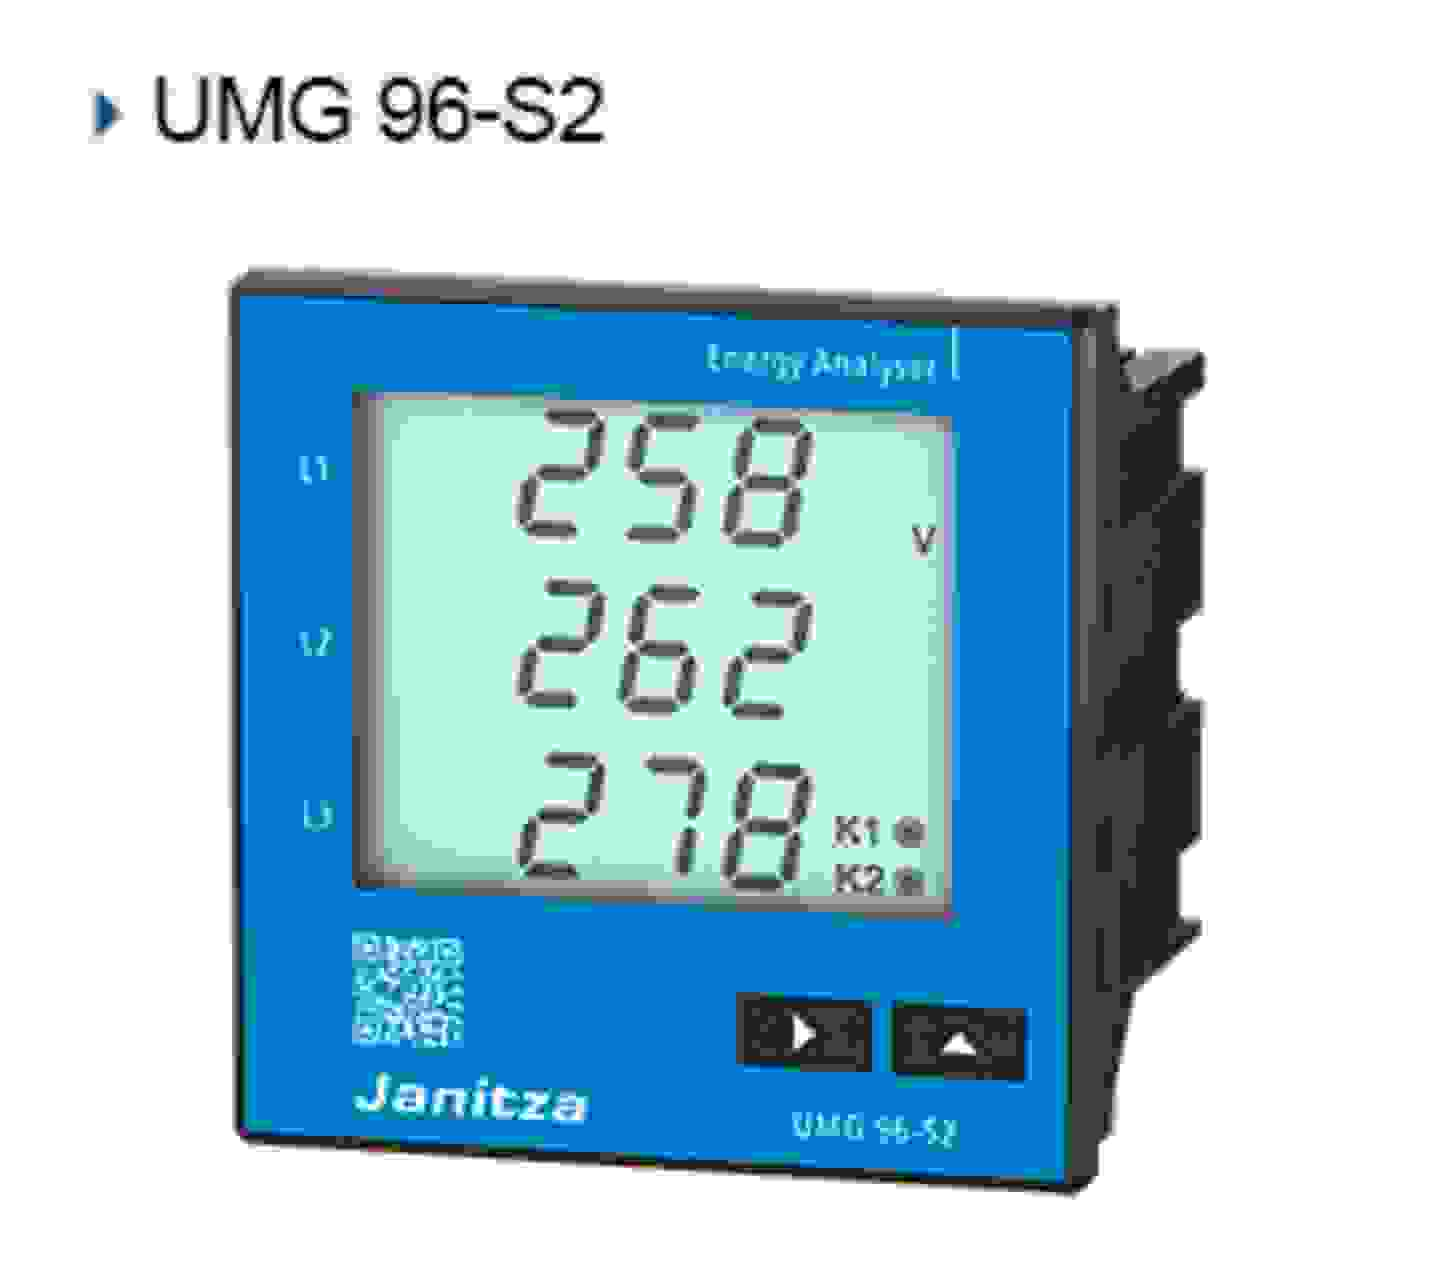 UMG 96-S2